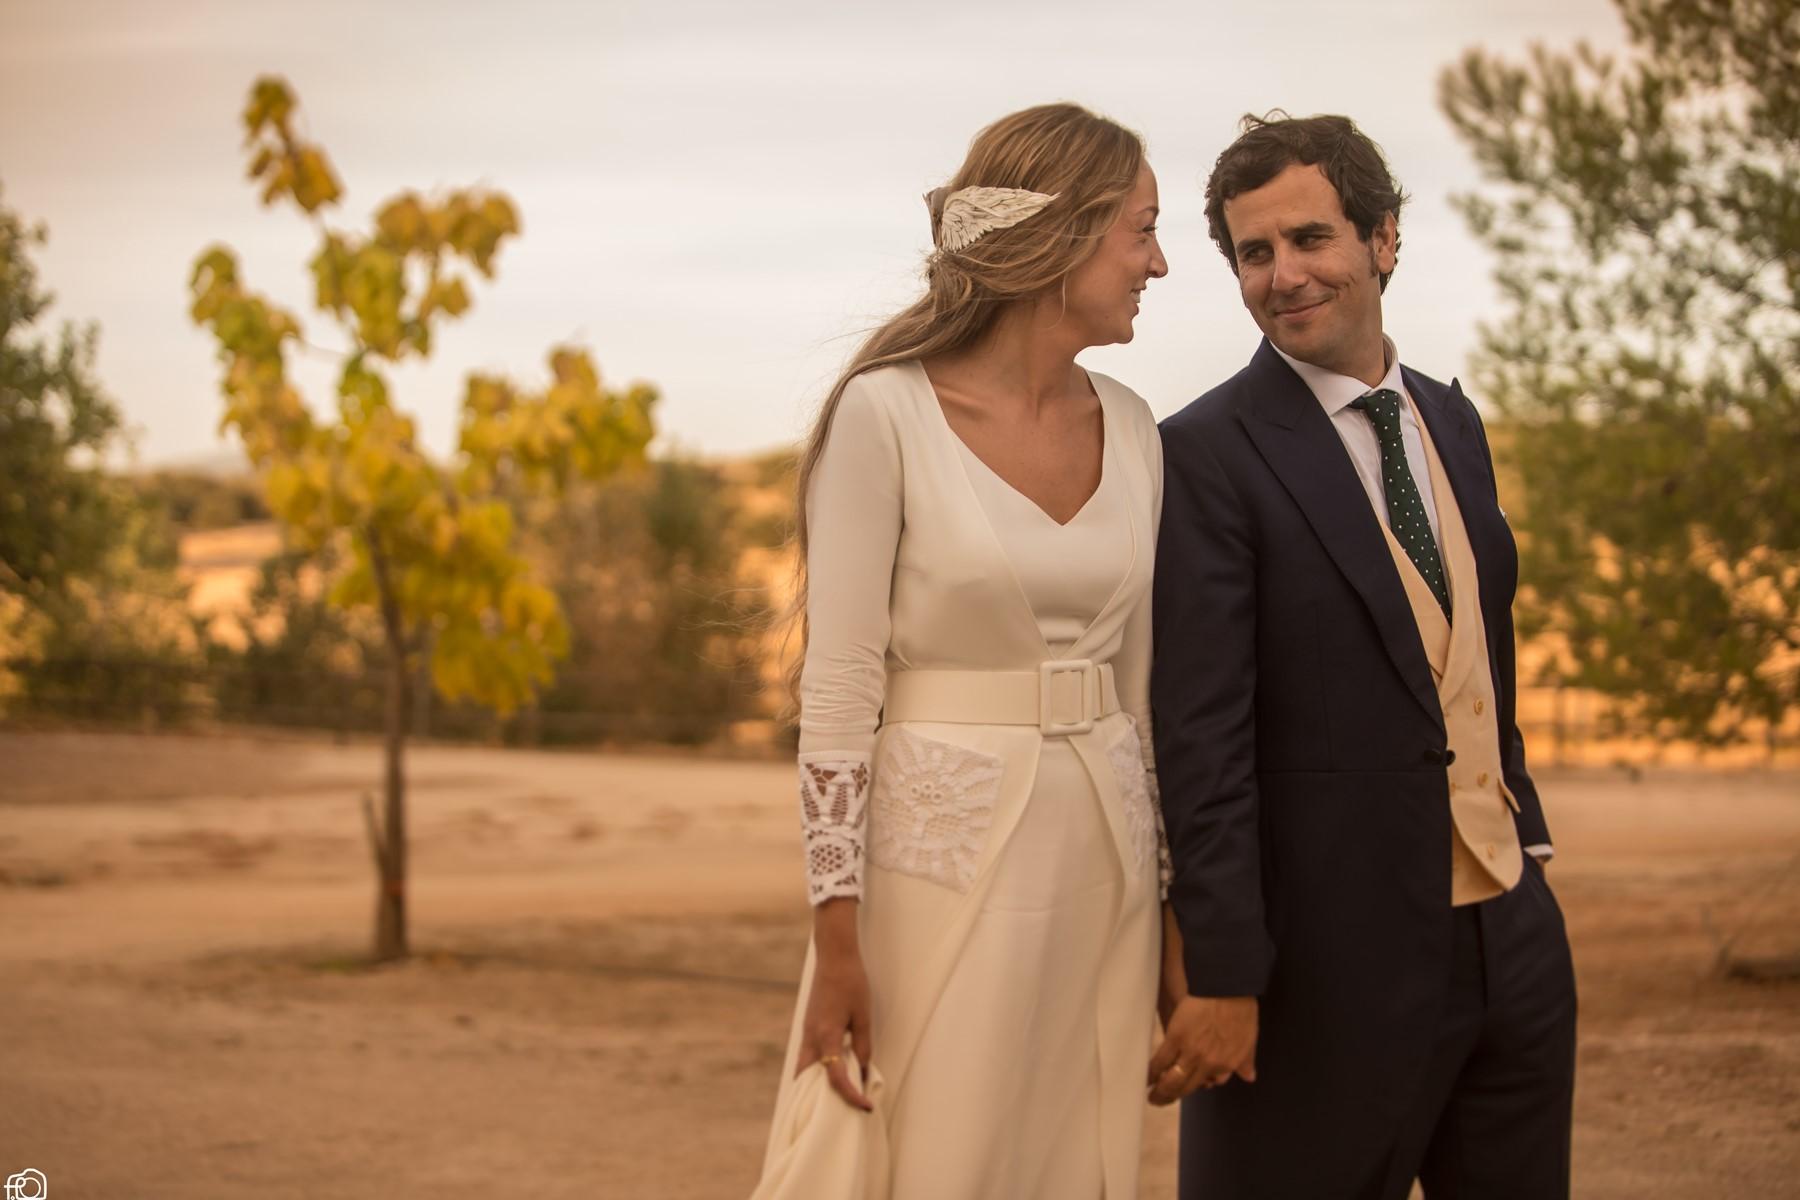 fb81d2f7b La boda de Cruces y Carli Le Plumeti Blog de Bodas